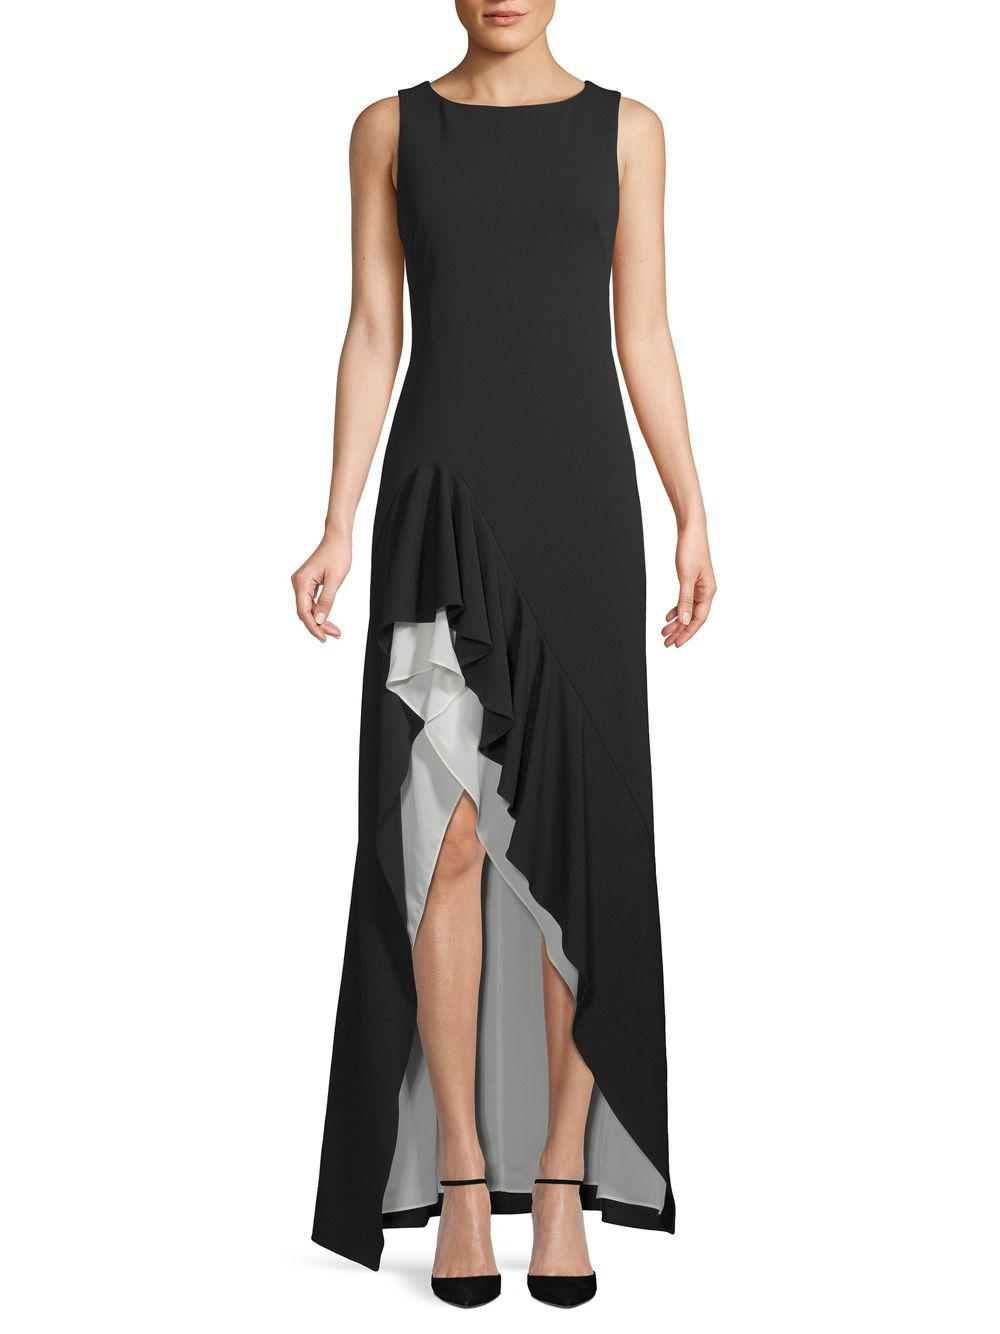 526a38b744c0 Lyst - Calvin Klein Sleeveless Ruffled Gown in Black